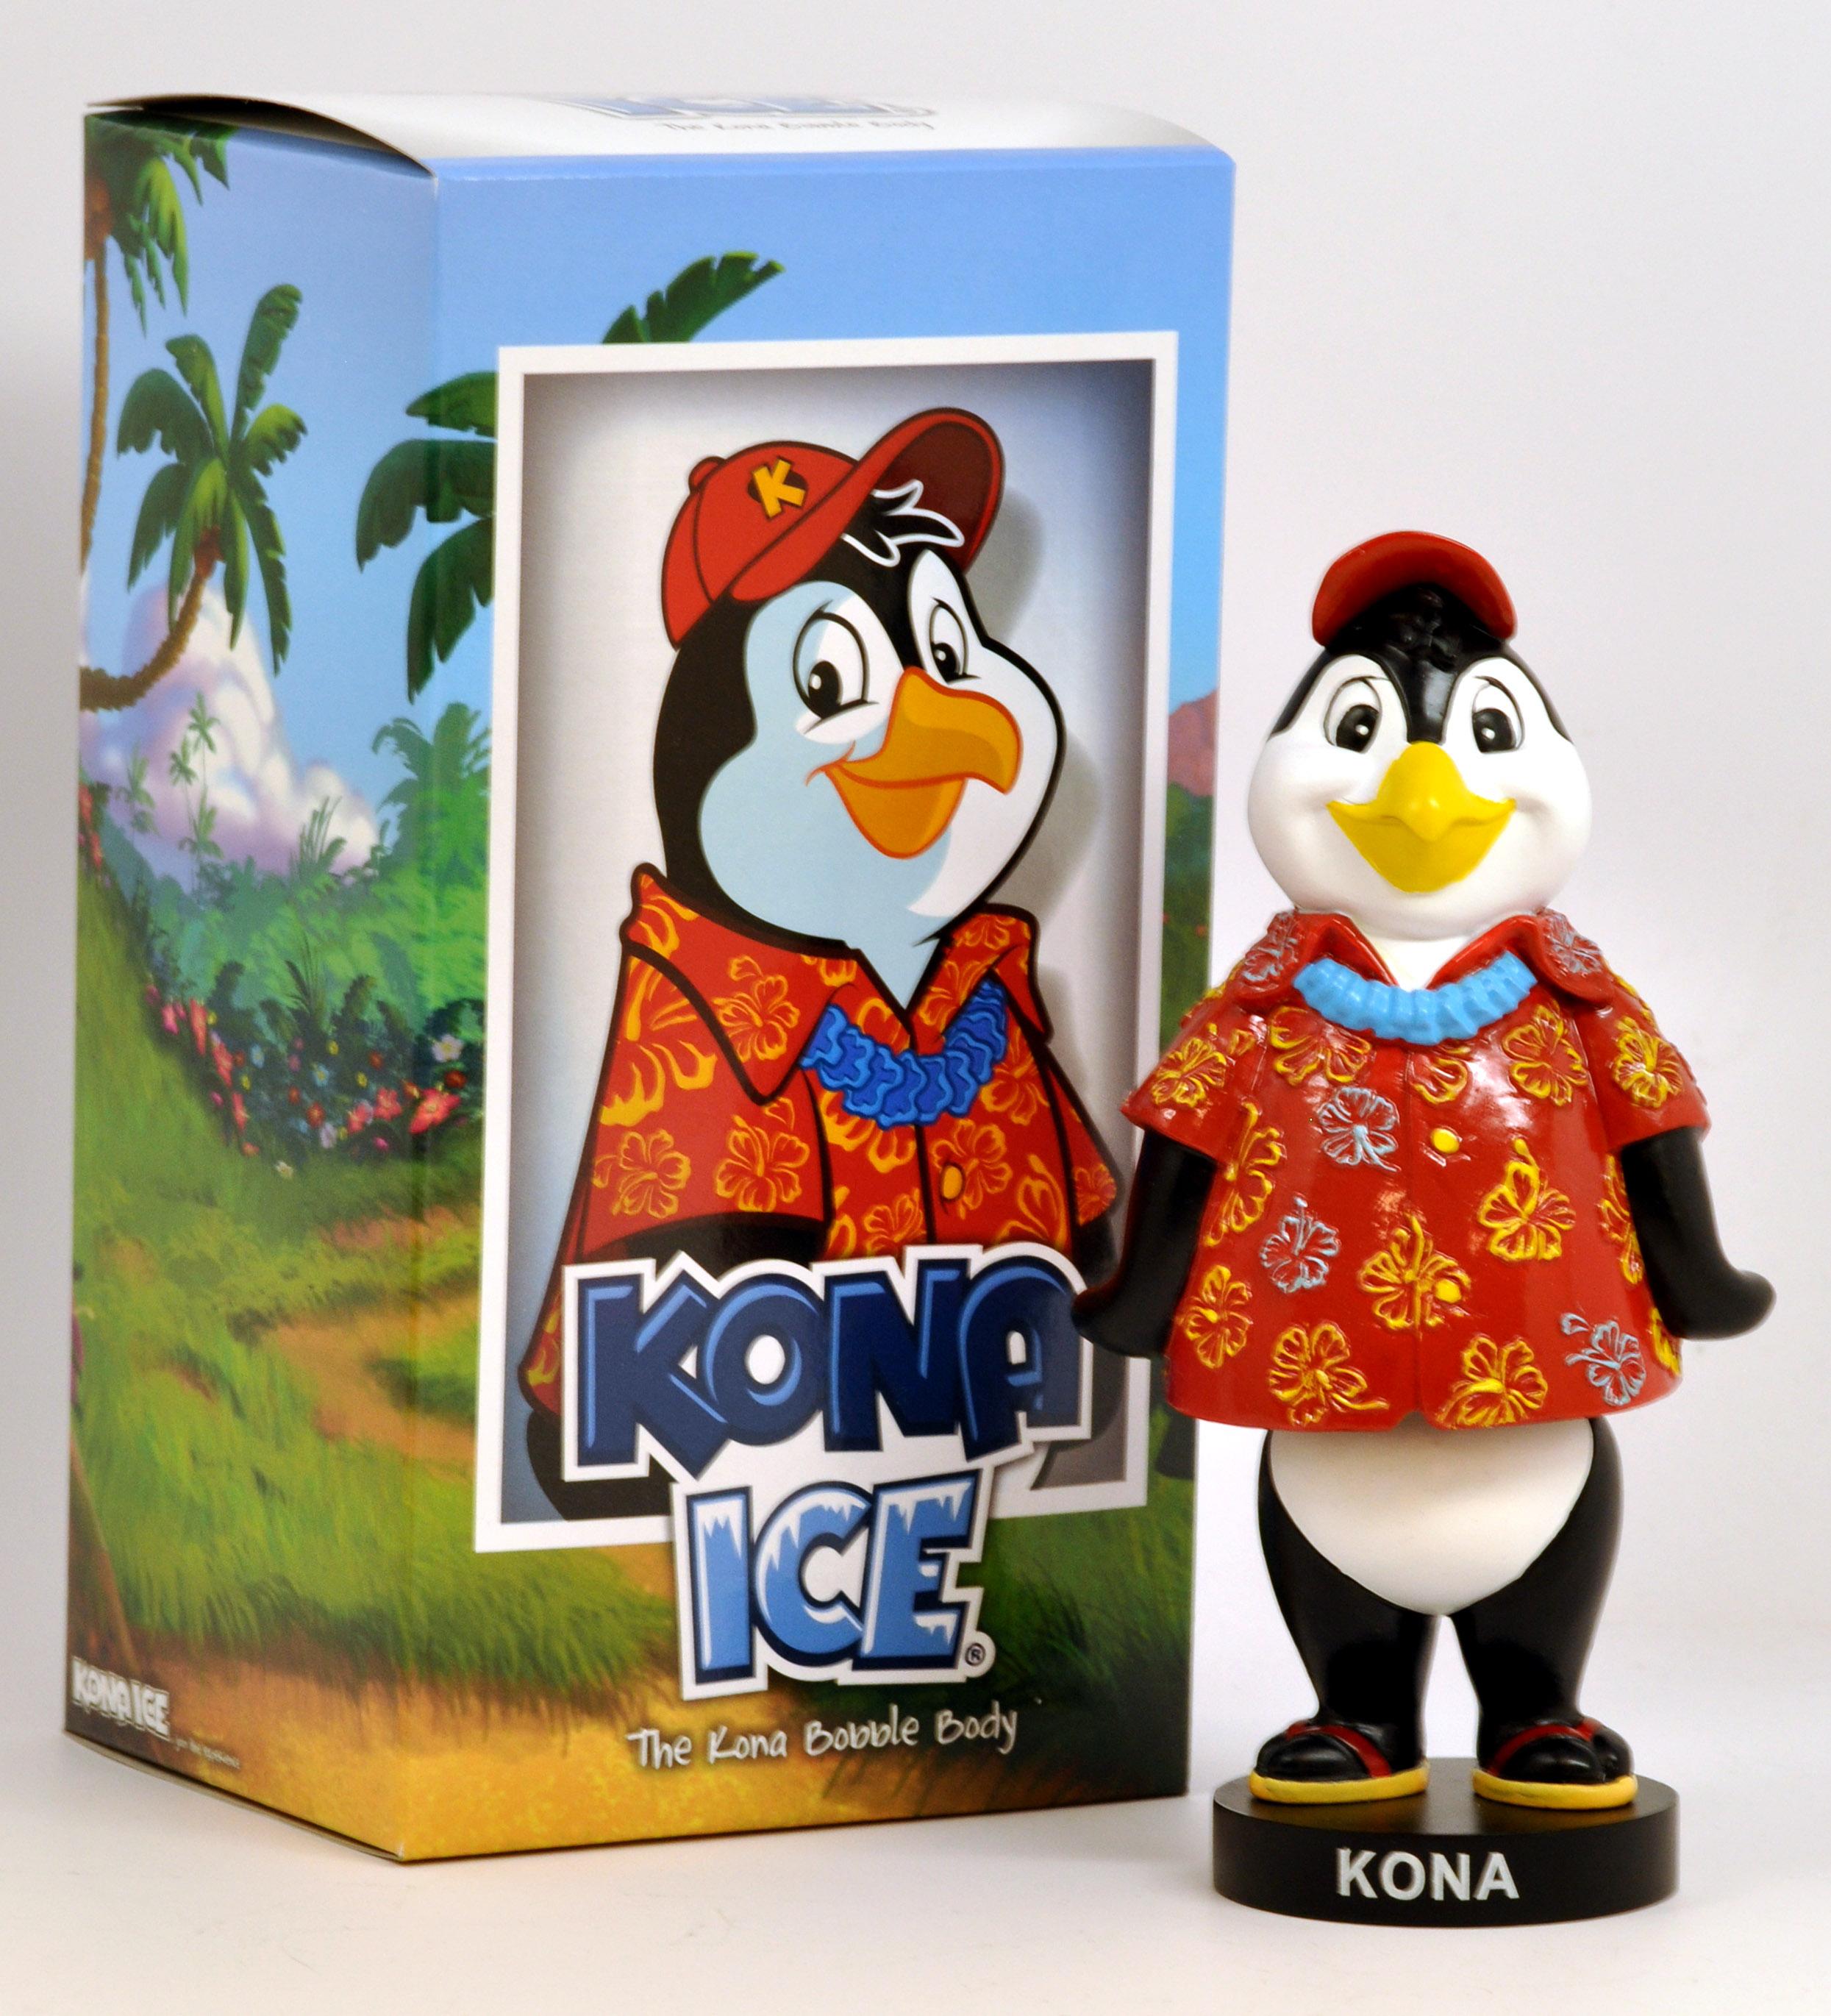 Kona Ice Truck Menu Related Keywords - Kona Ice Truck Menu ...